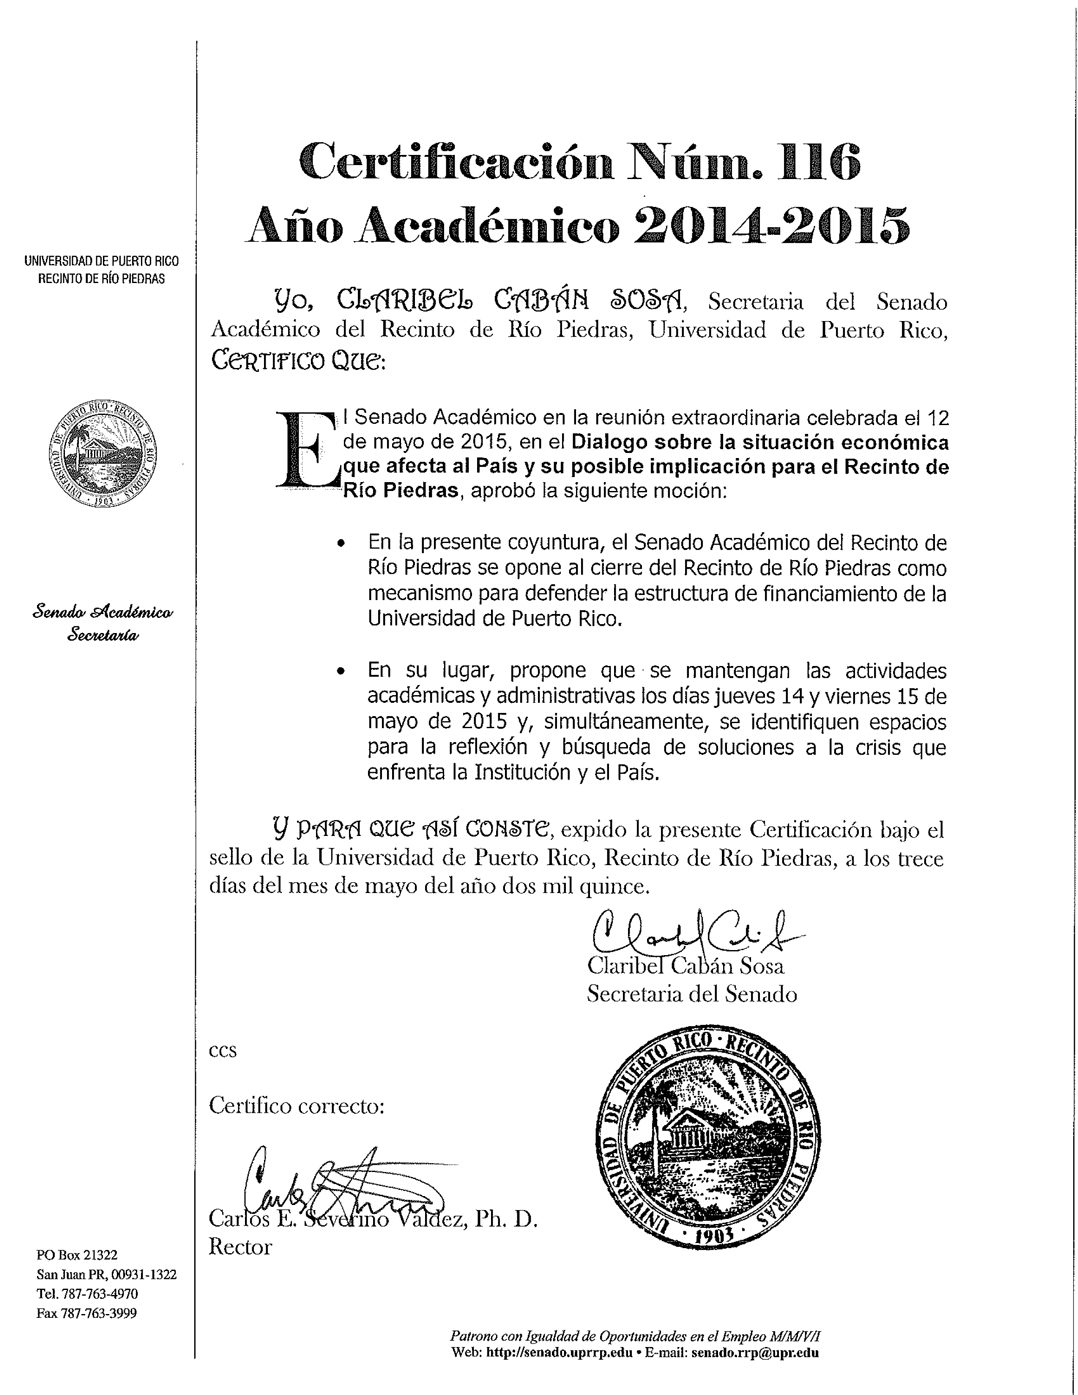 Certificación-116-Senado-Académico-UPR-RP